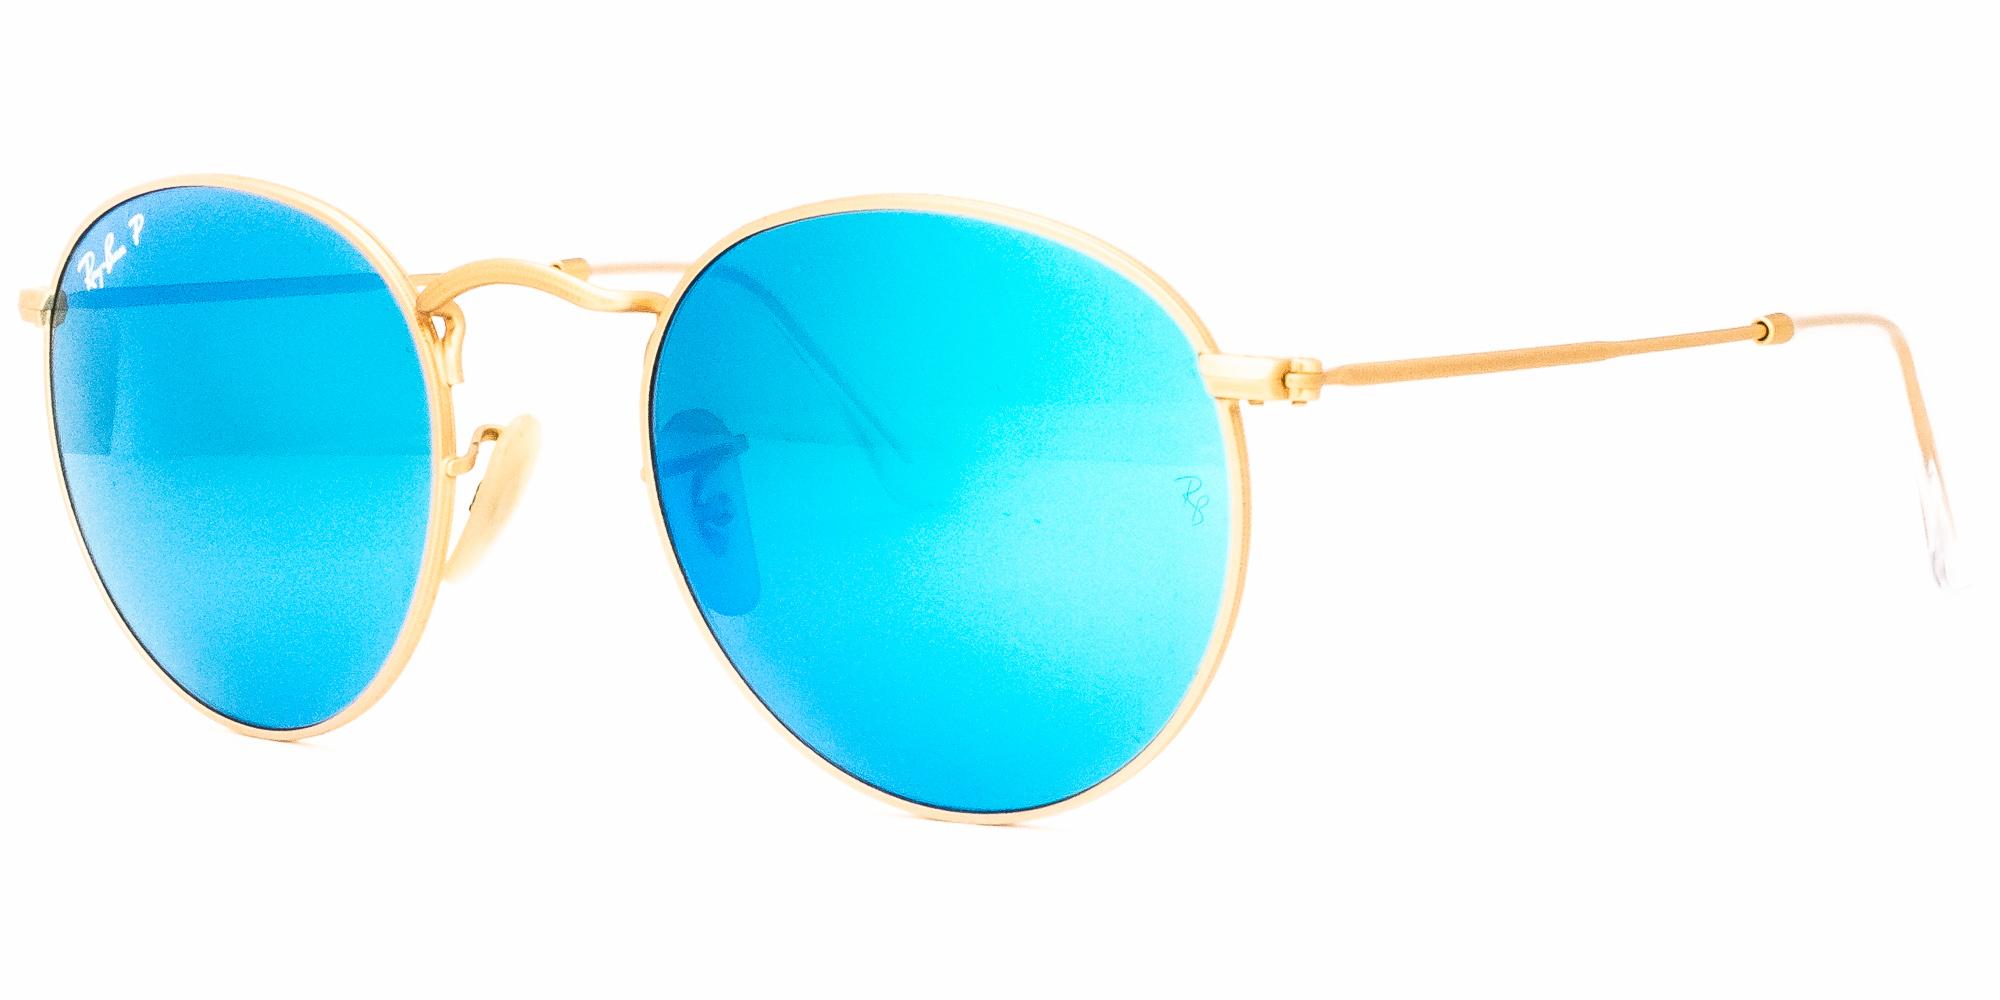 Ray Ban 3447 Sunglasses 746f95c25e